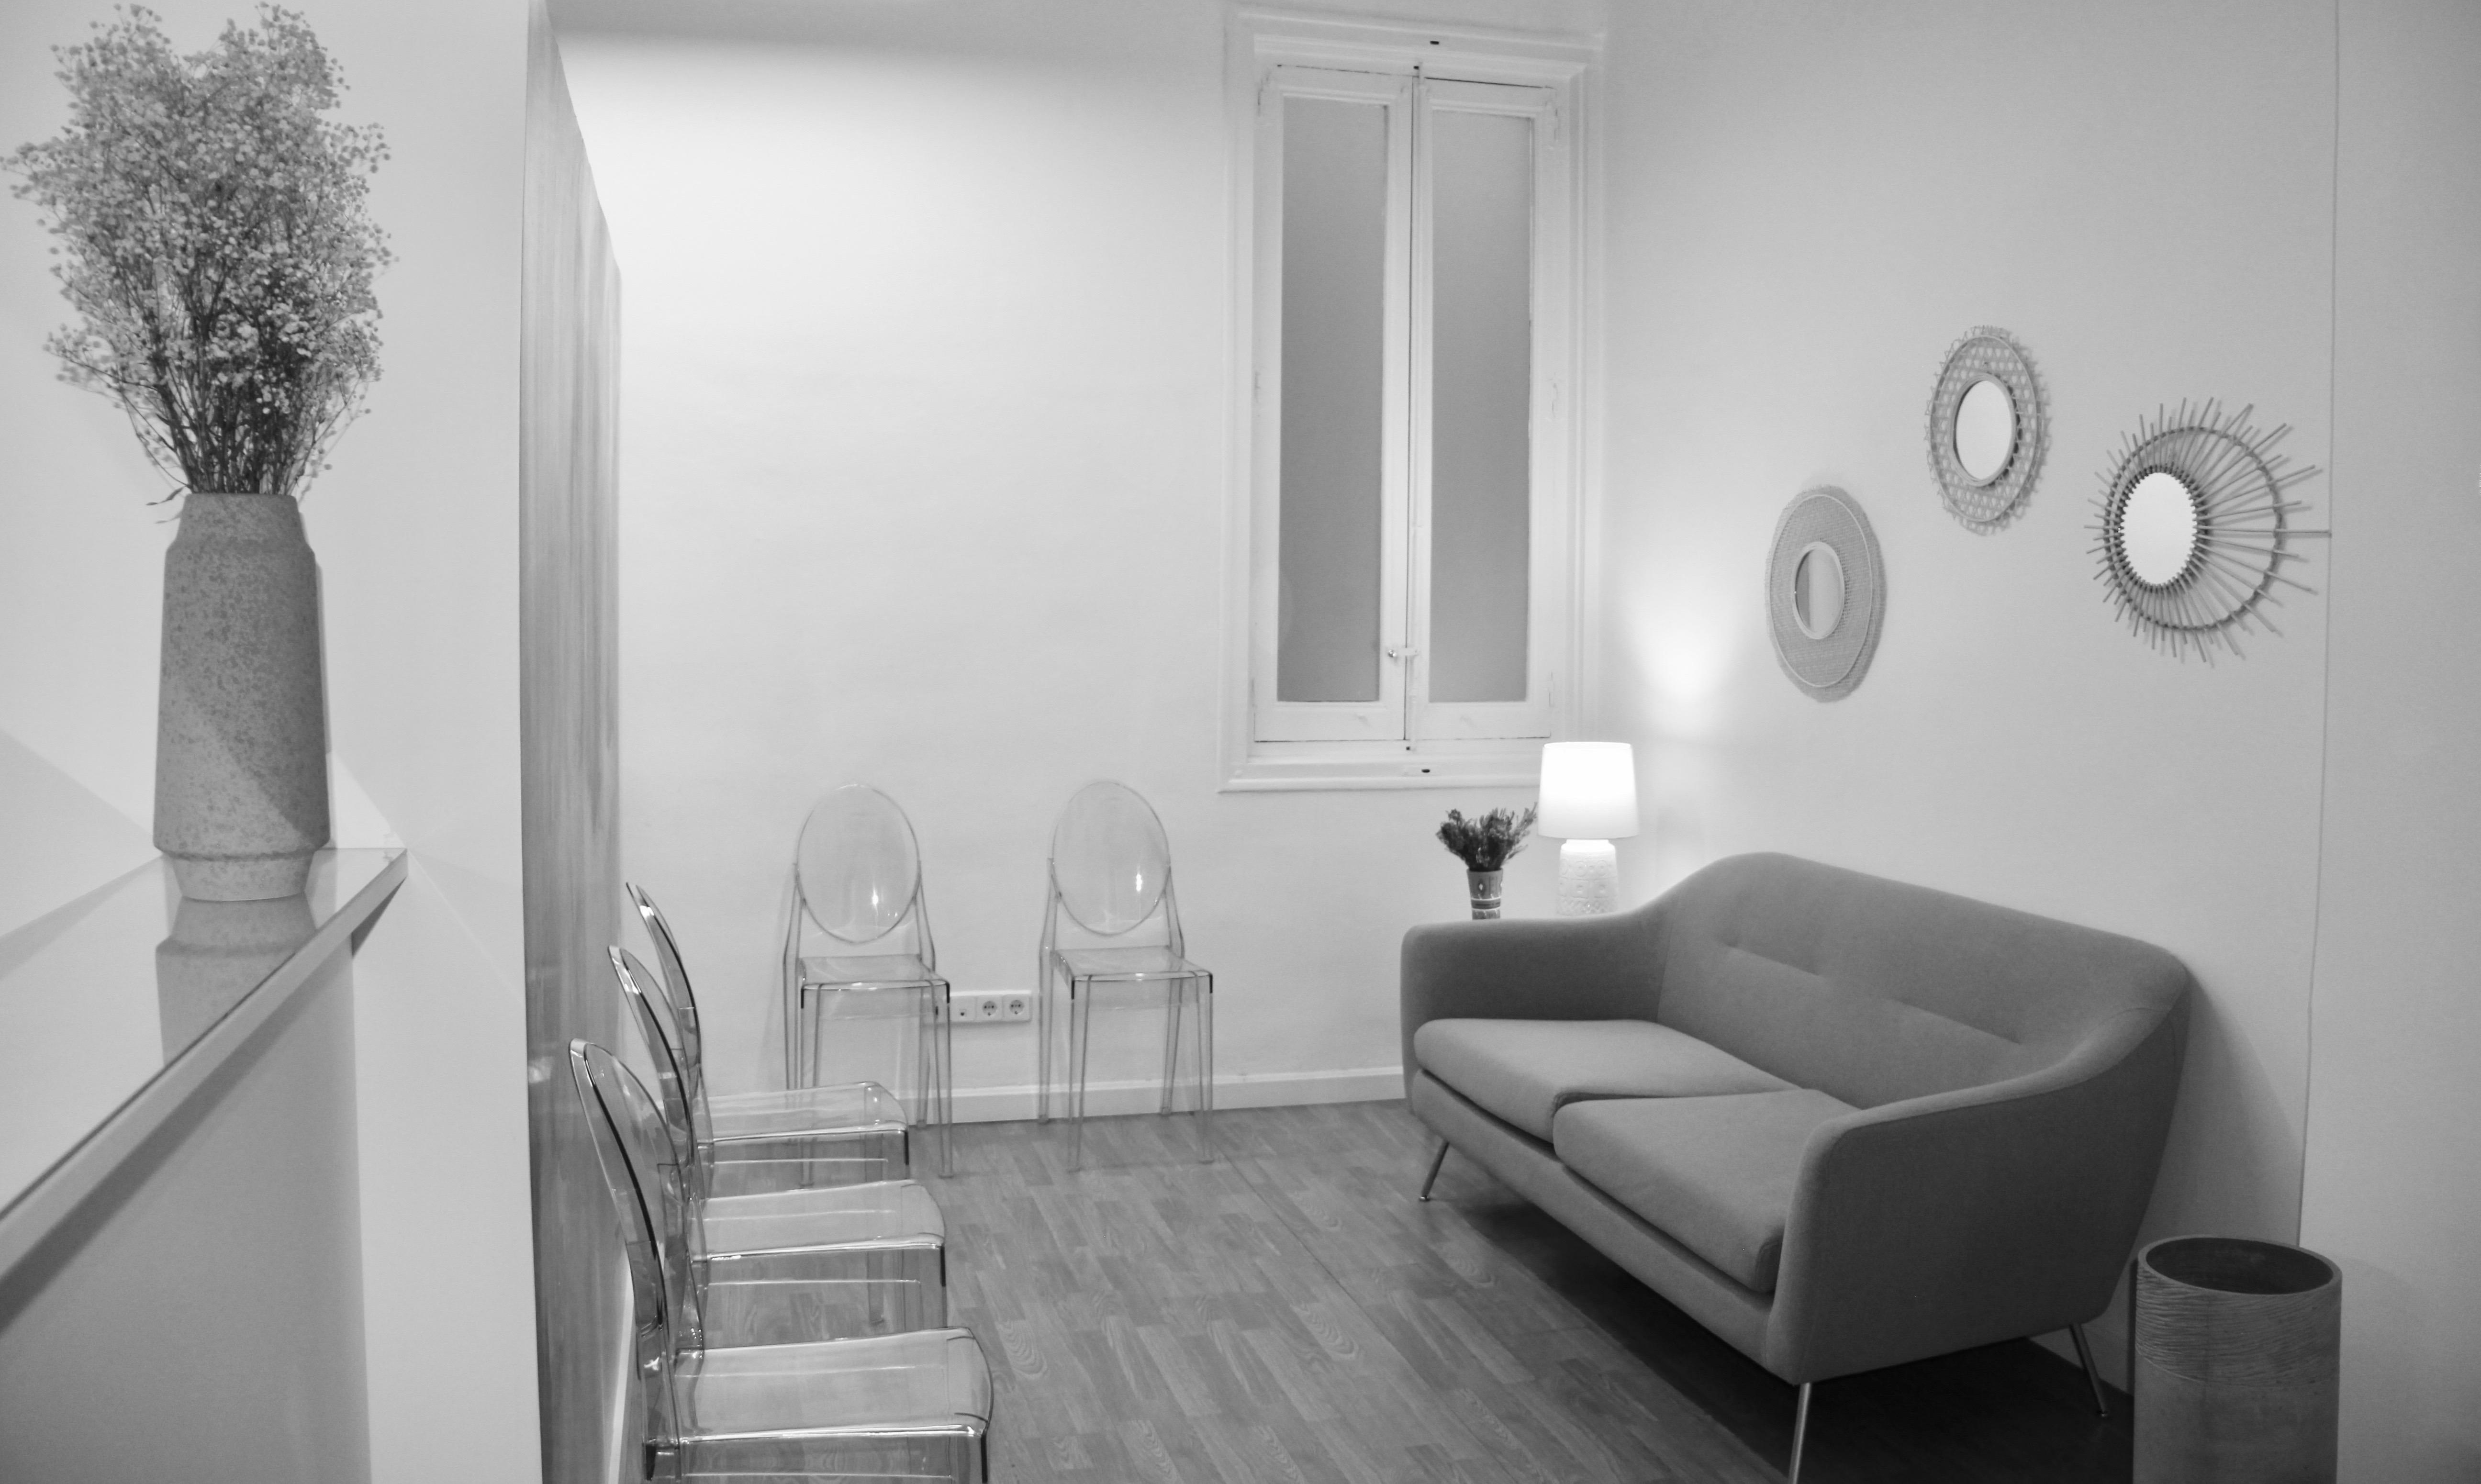 Sala Espera Oficina Calle Núñez de Balboa Madrid. El Prado Psicólogos